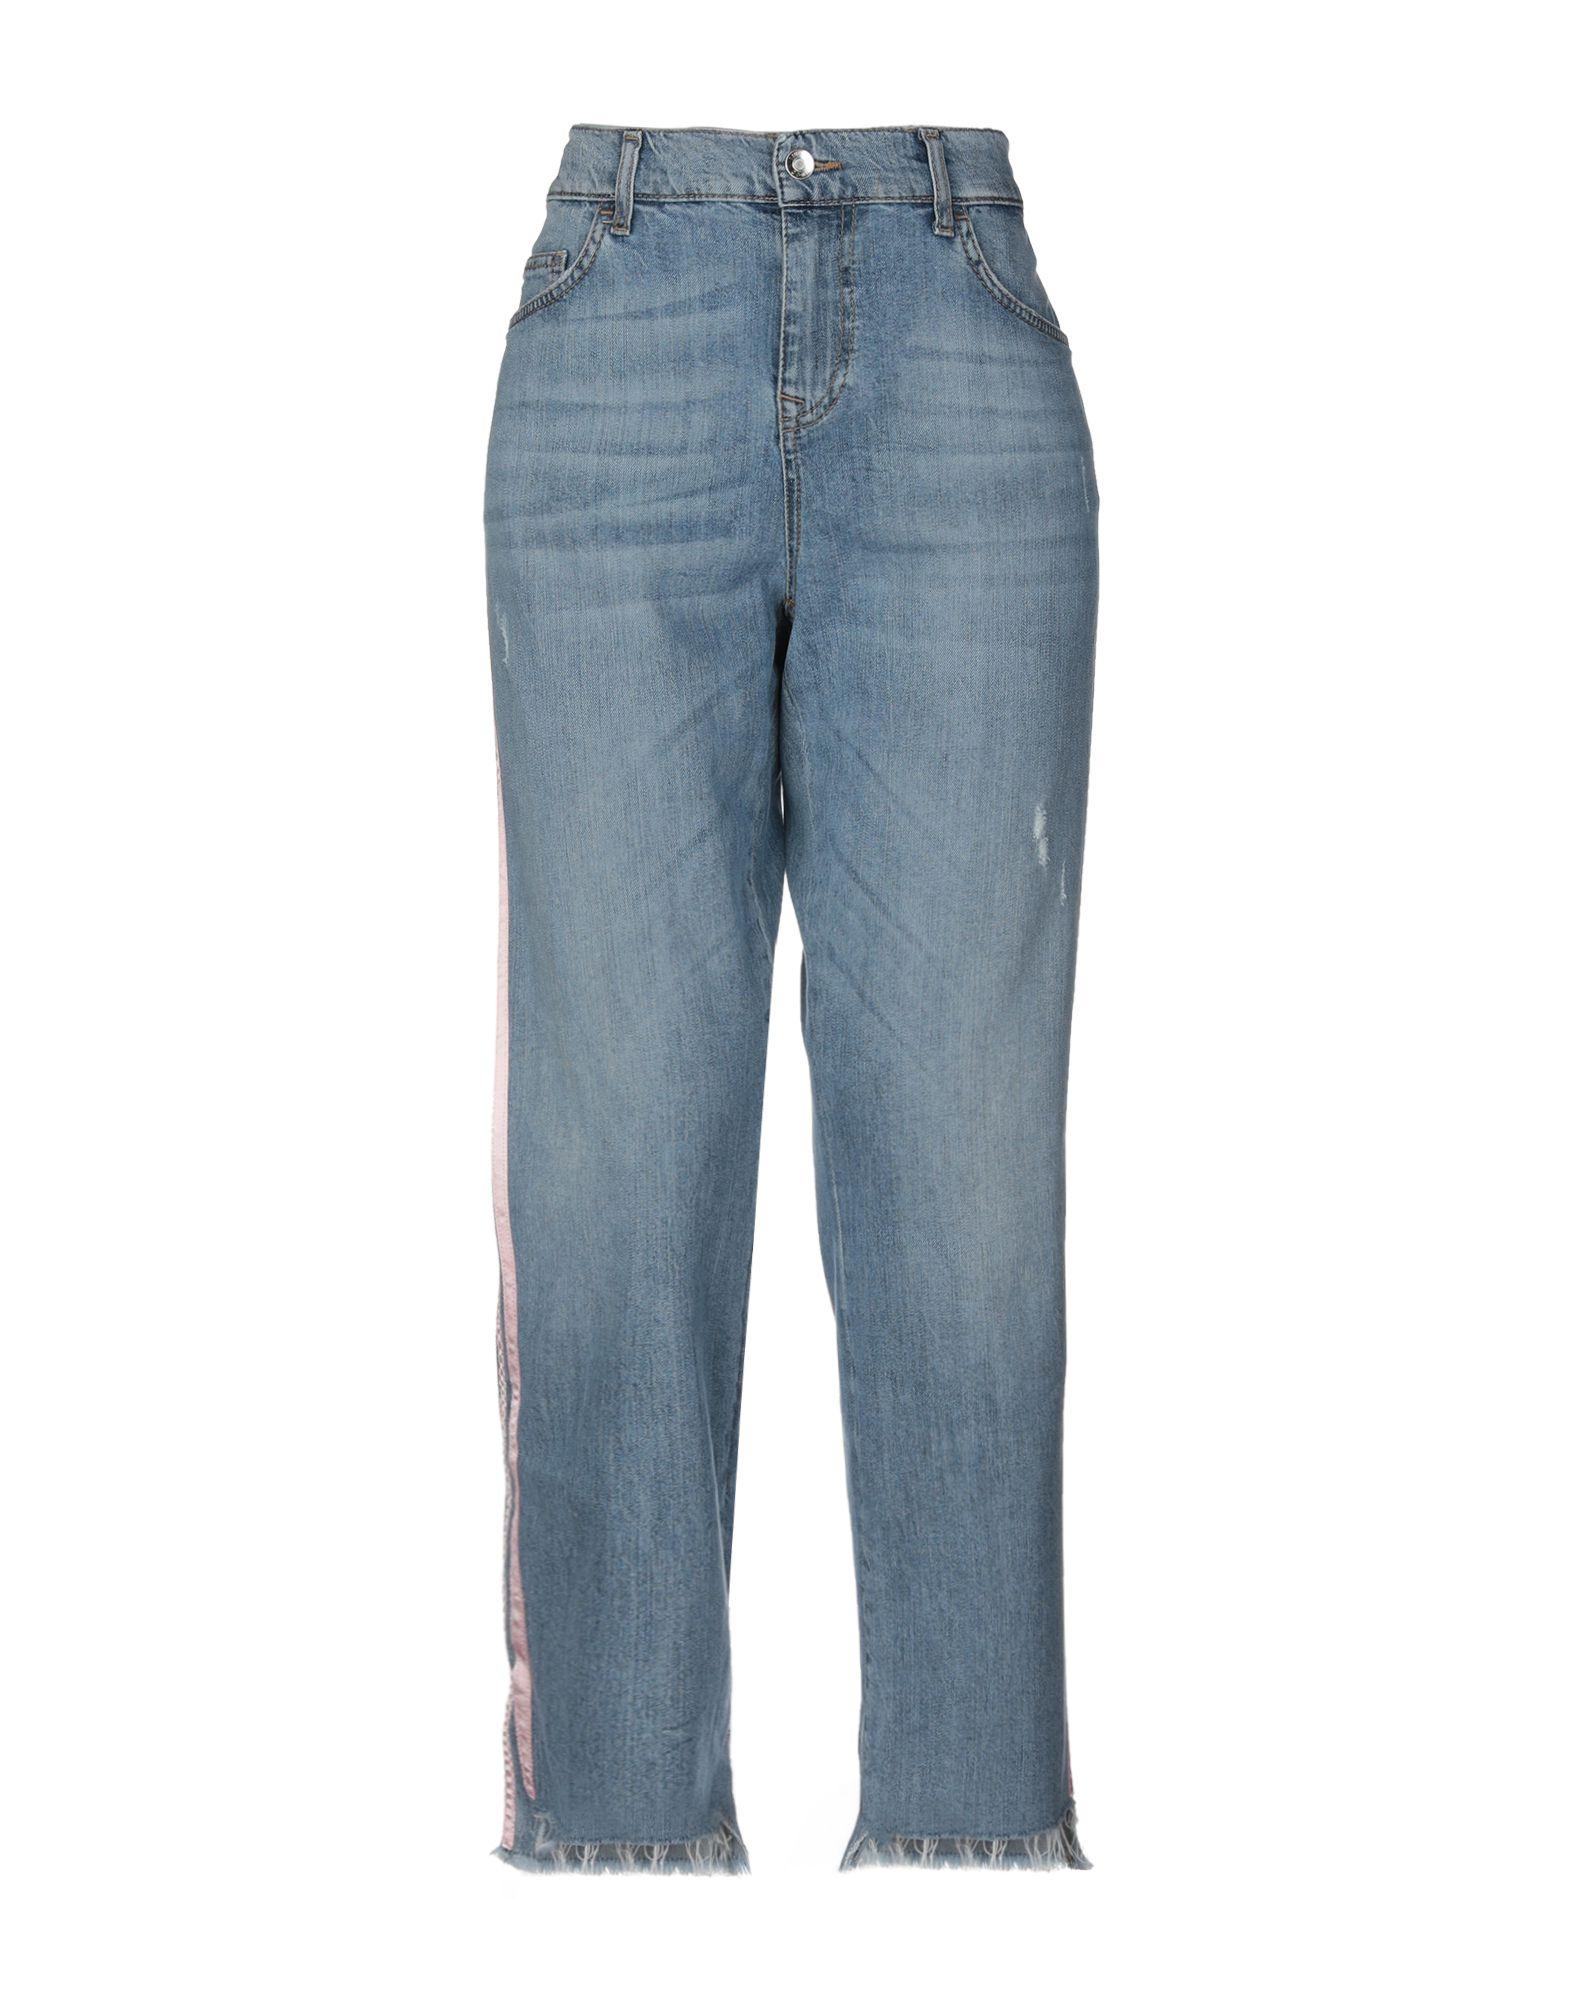 info for 1ec36 0ef96 LIU •JO Denim pants - Jeans and Denim | YOOX.COM